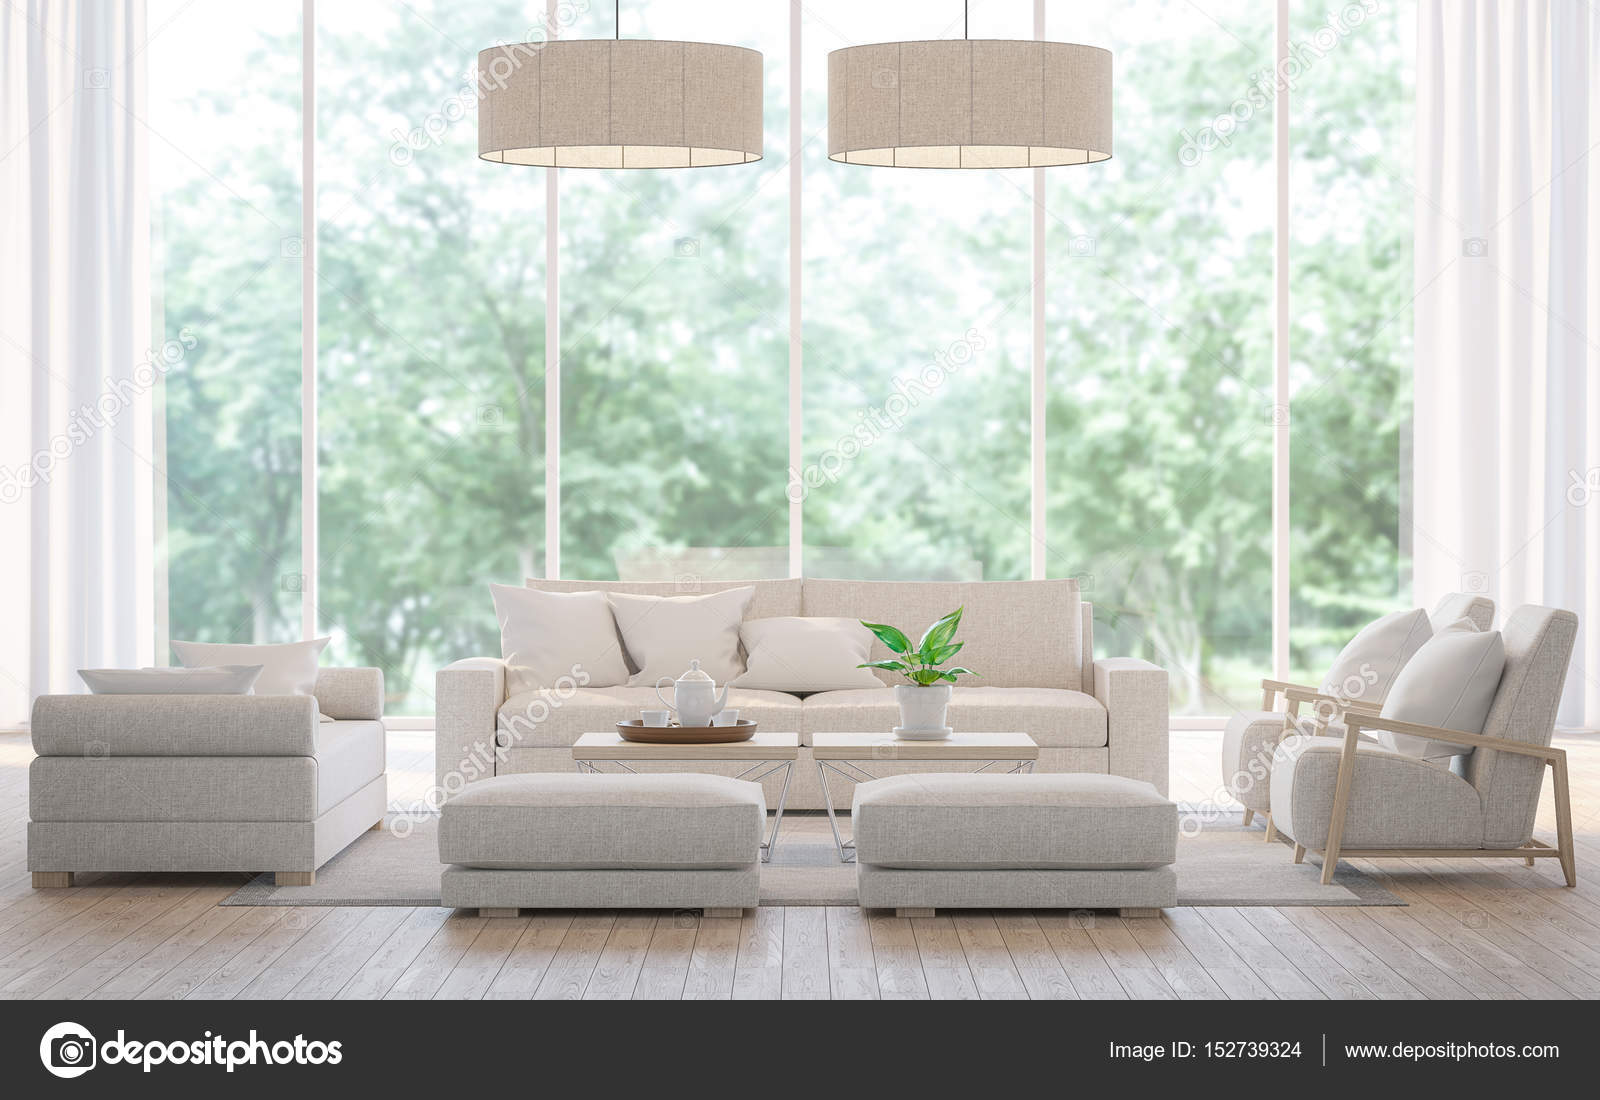 Moderne witte woonkamer in het forest 3d Rendering beeld — Stockfoto ...